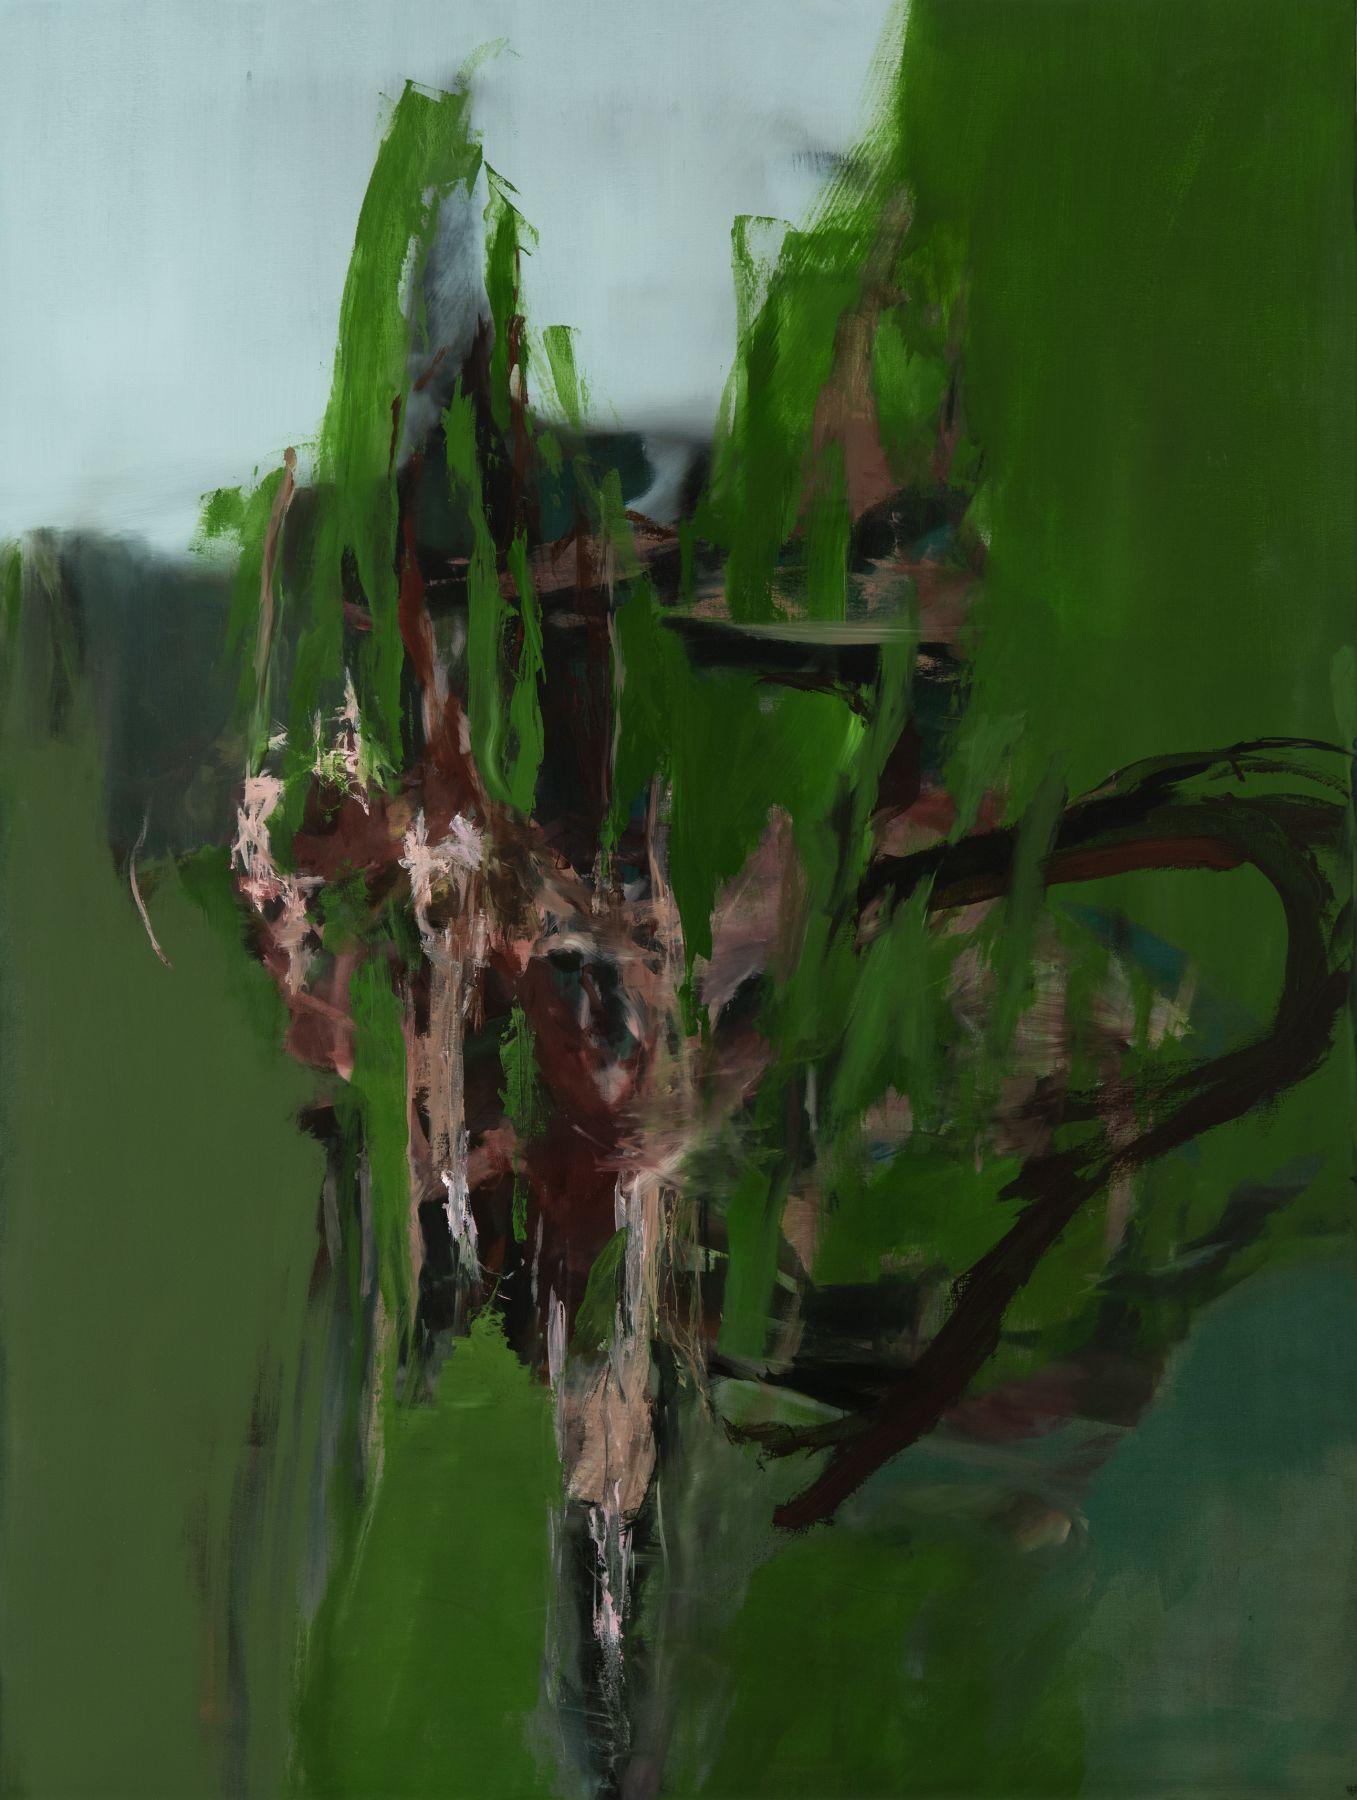 Hollis Heichemer (b. 1963) Continuum #7, 2017